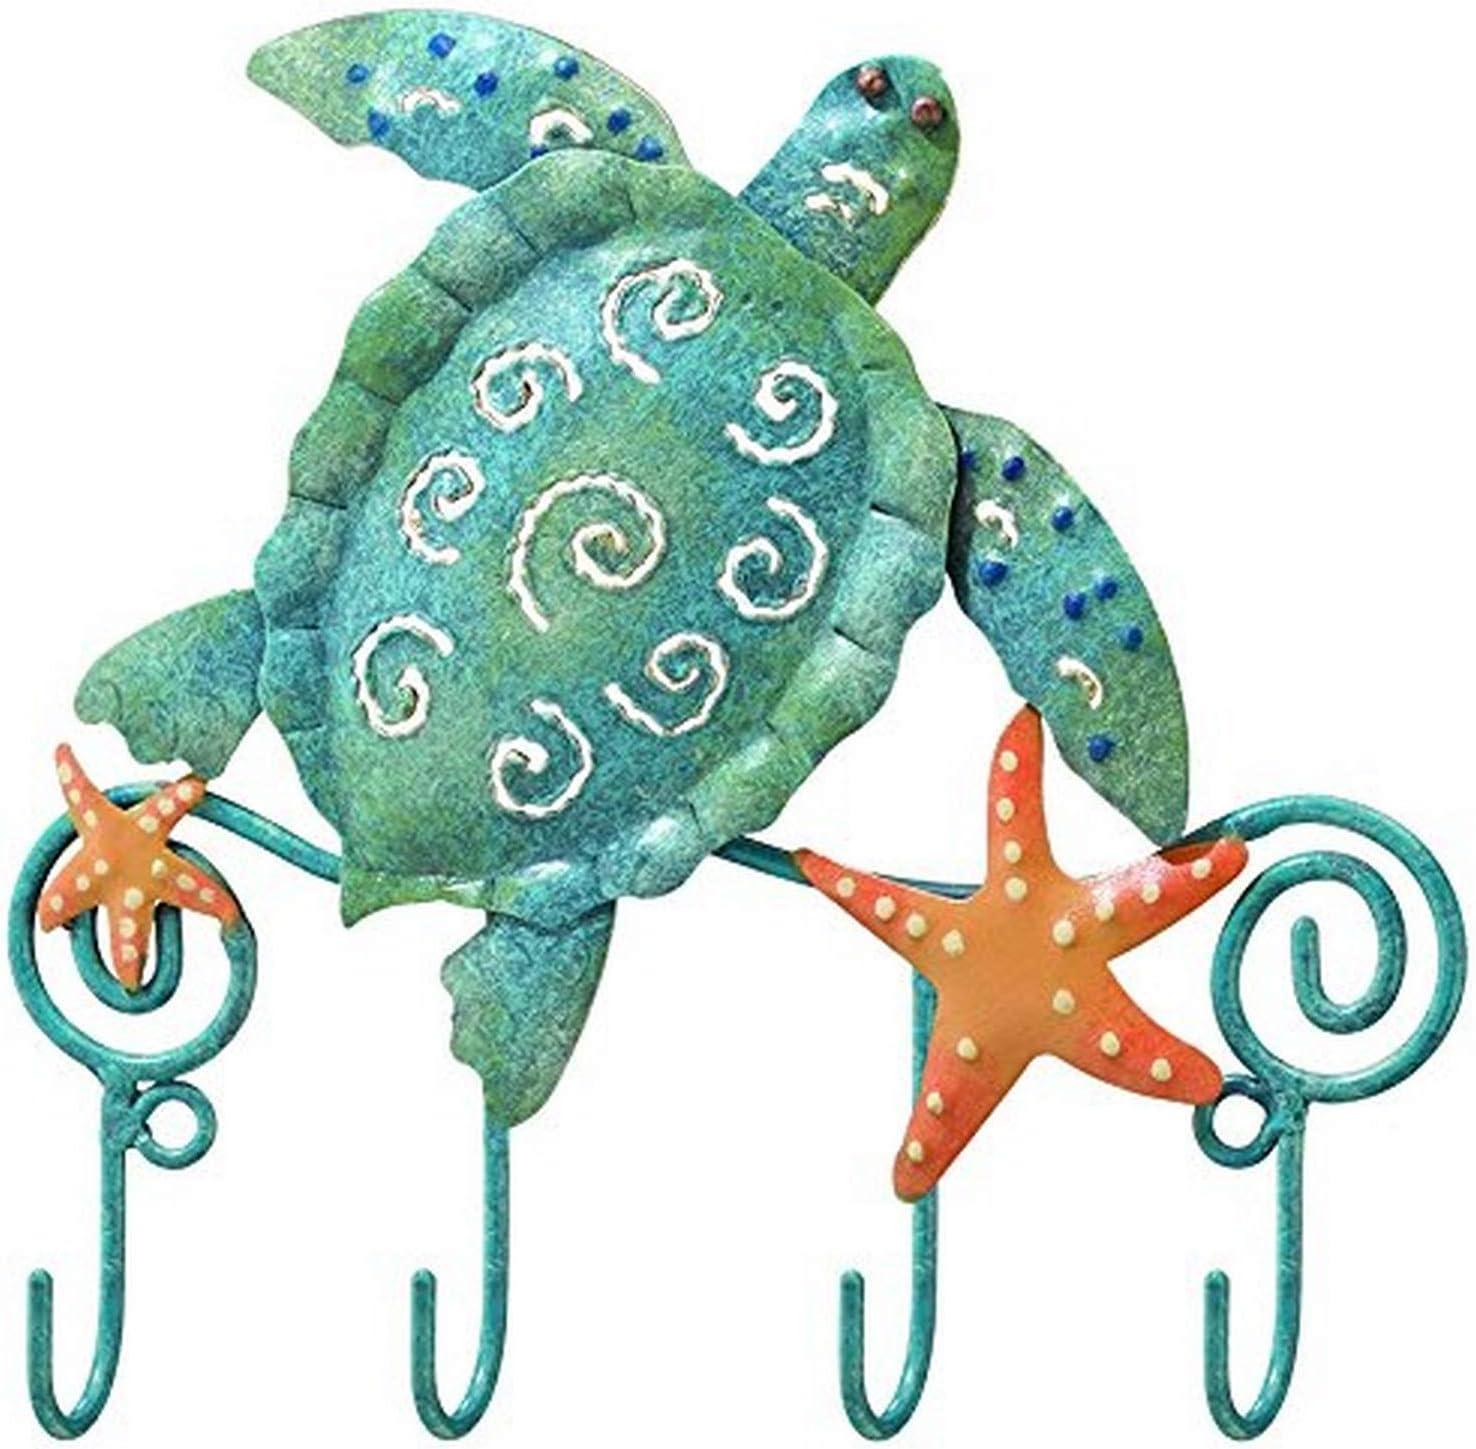 Regal Art /& Gift Regal Art and Gift 5031 Sea Turtle Key Hook